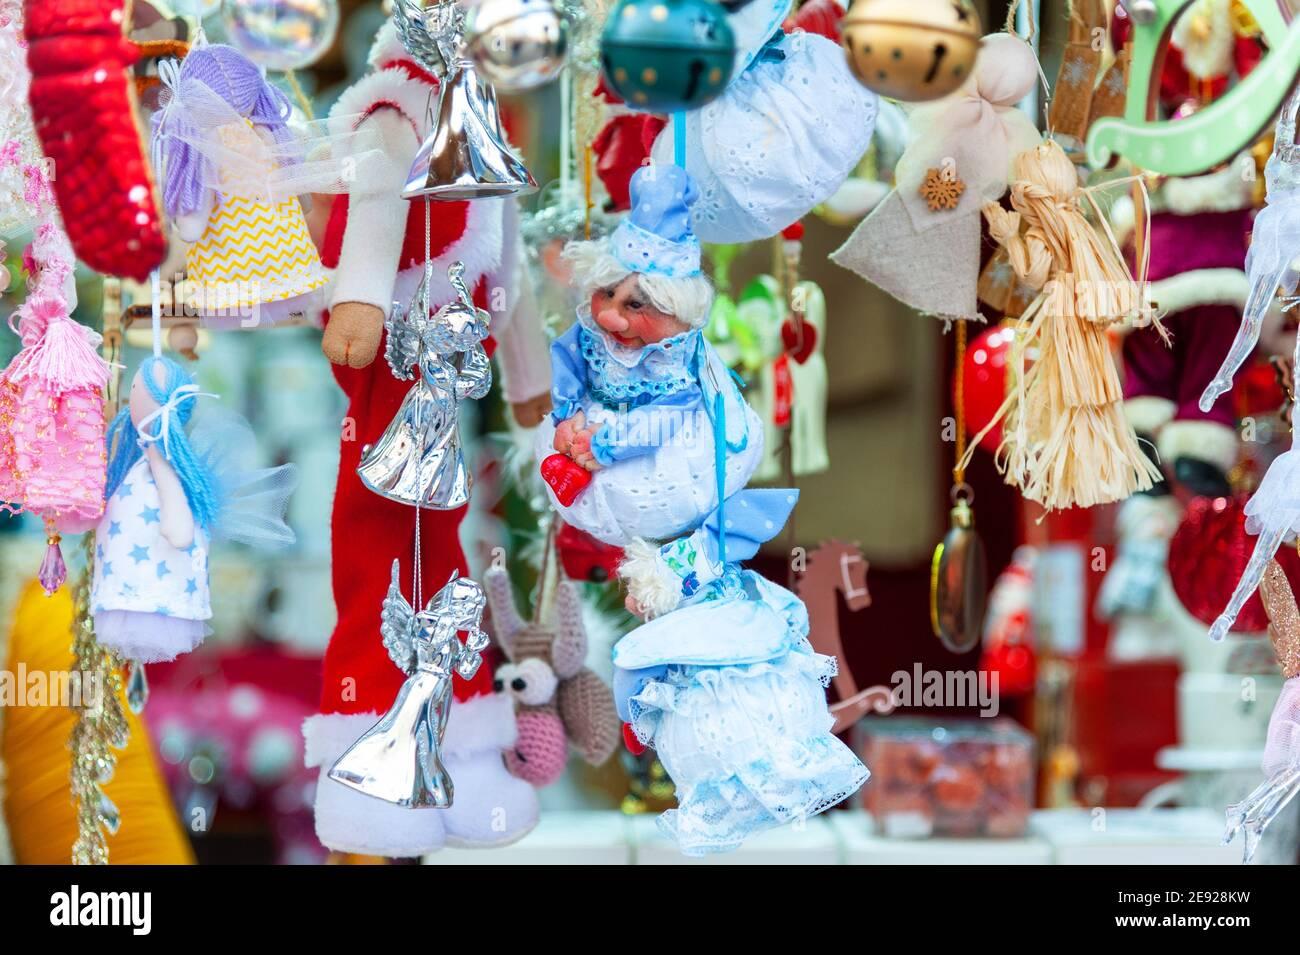 Lviv Christmas Market 2021 Food Market Lviv Ukraine High Resolution Stock Photography And Images Alamy